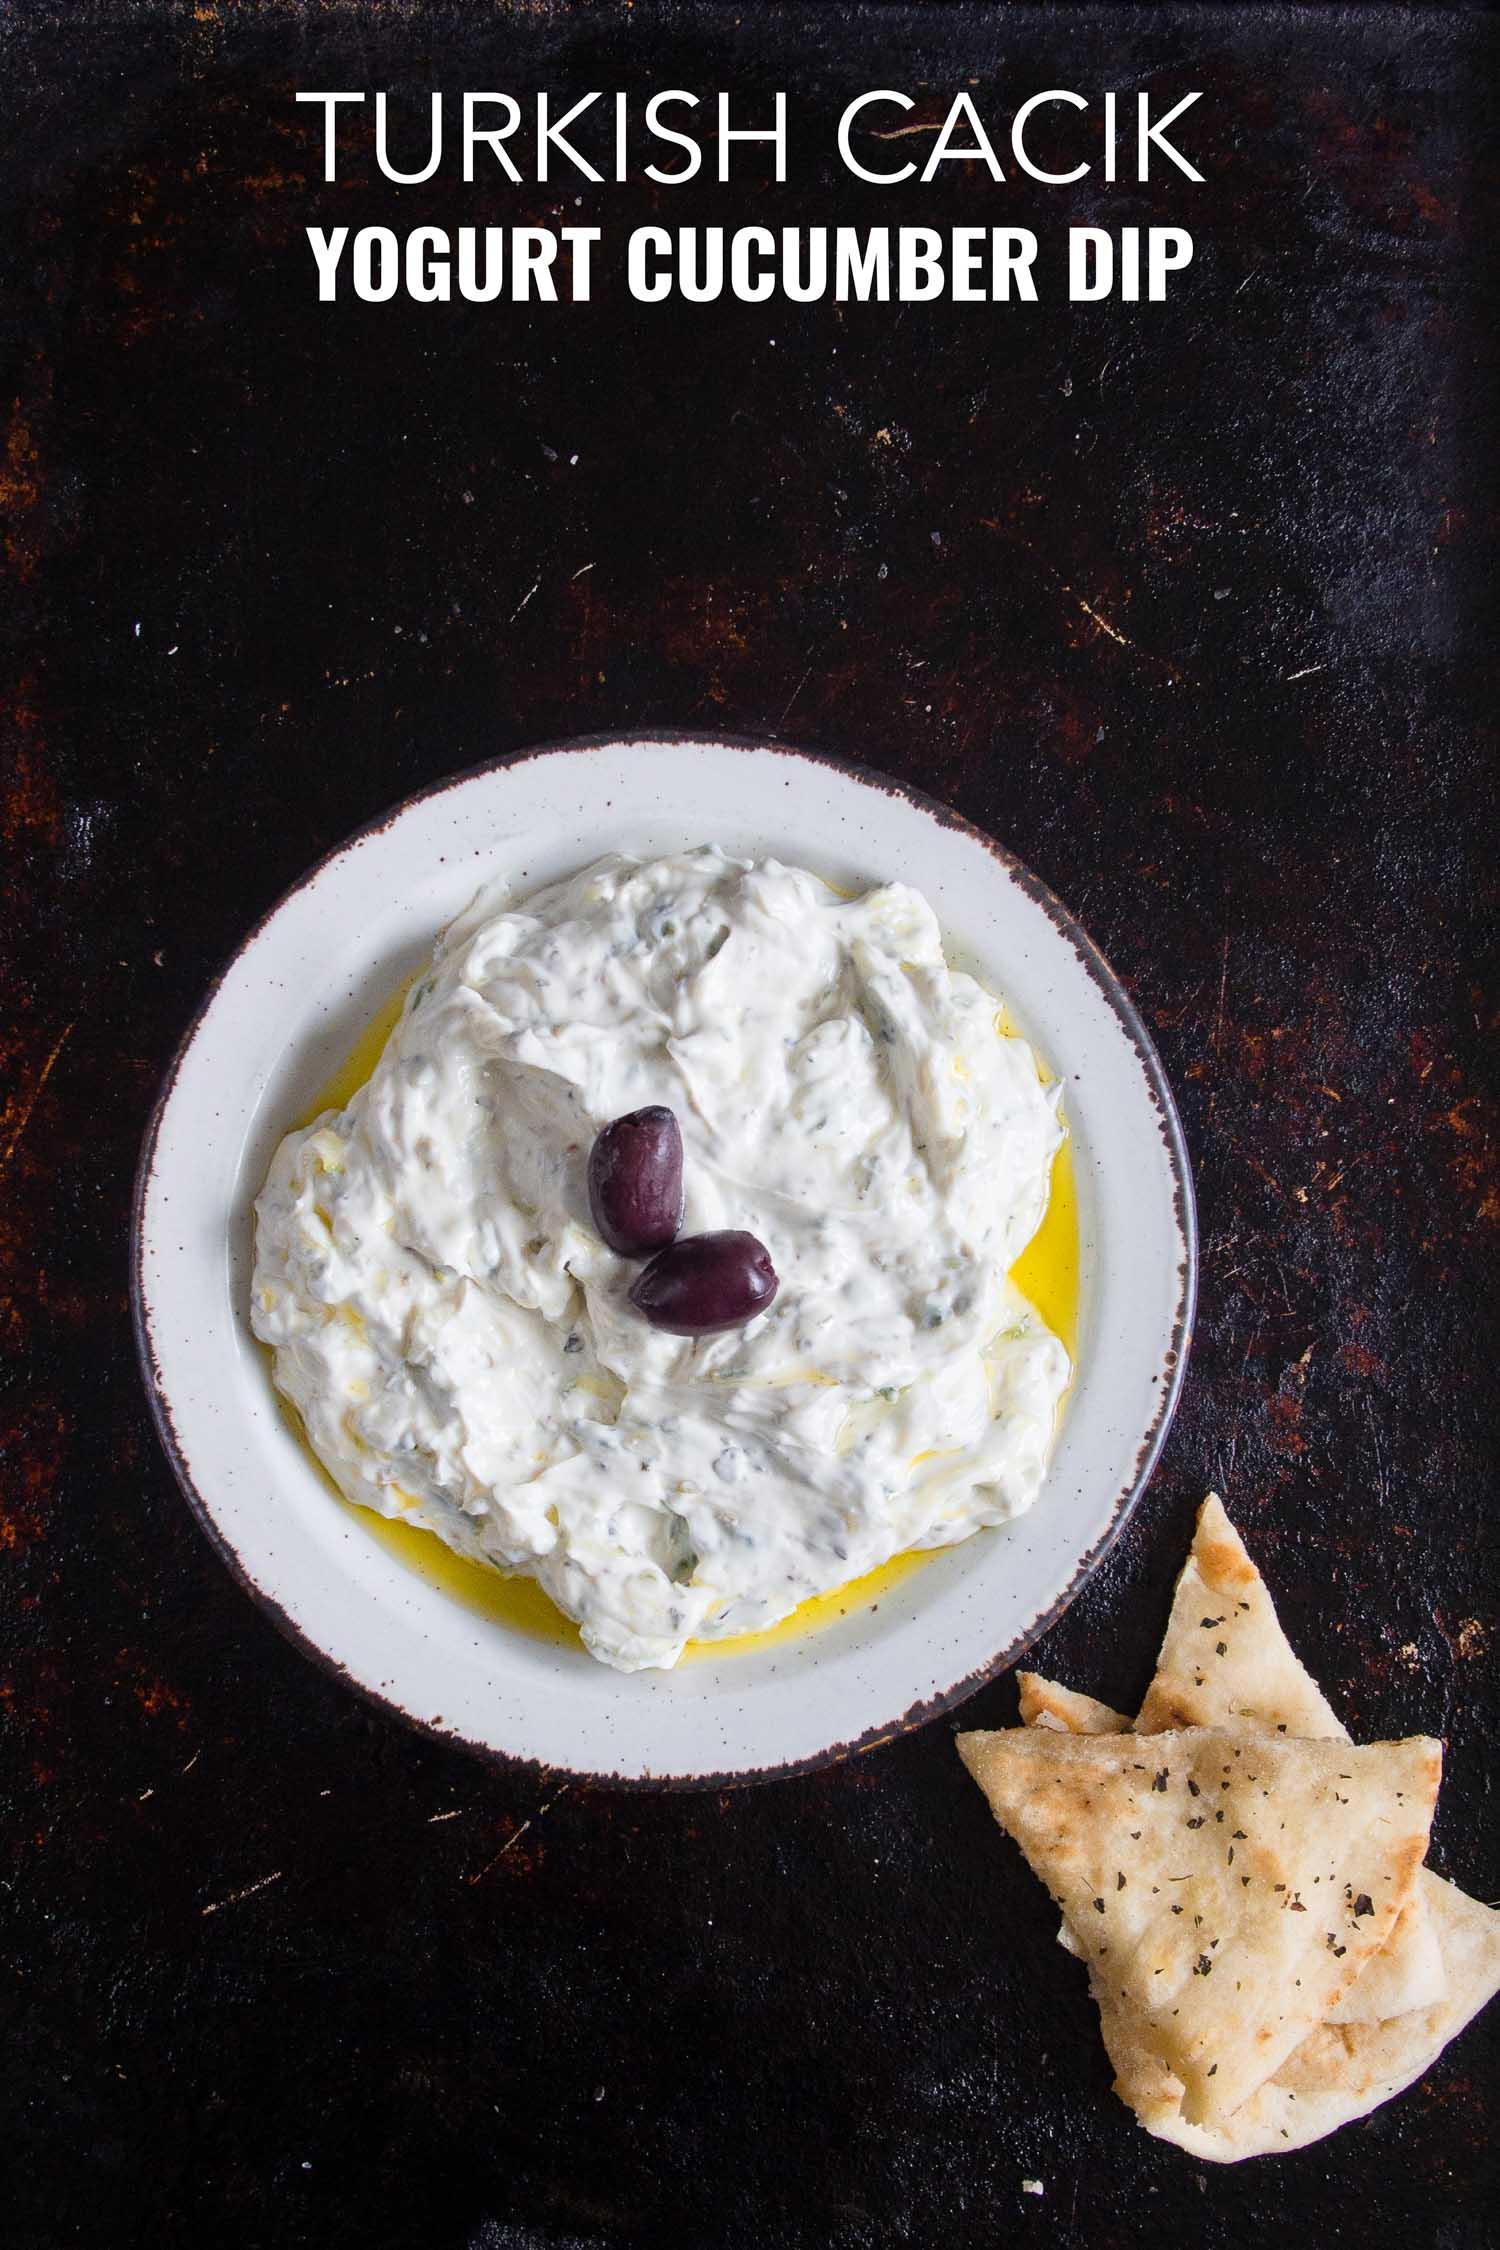 Turkish cucumber yogurt dip on a white plate and black background